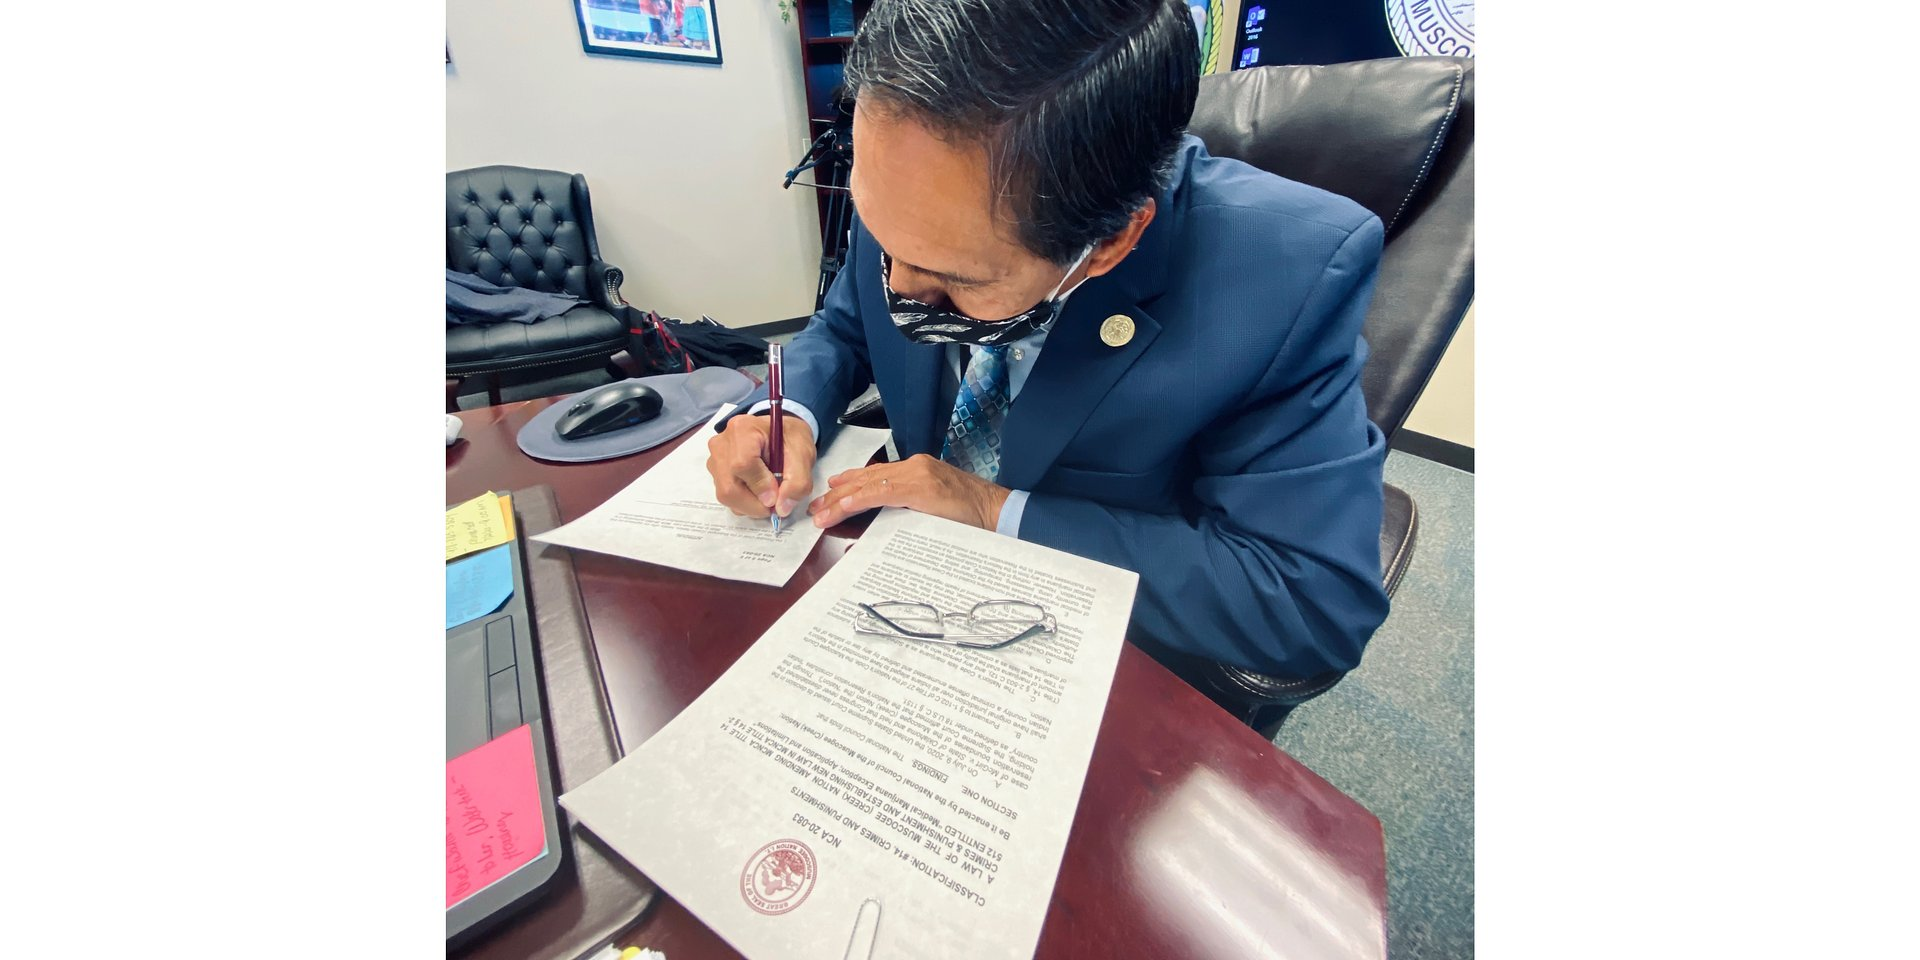 Muscogee (Creek) Nation passes legislation for medical marijuana exemption